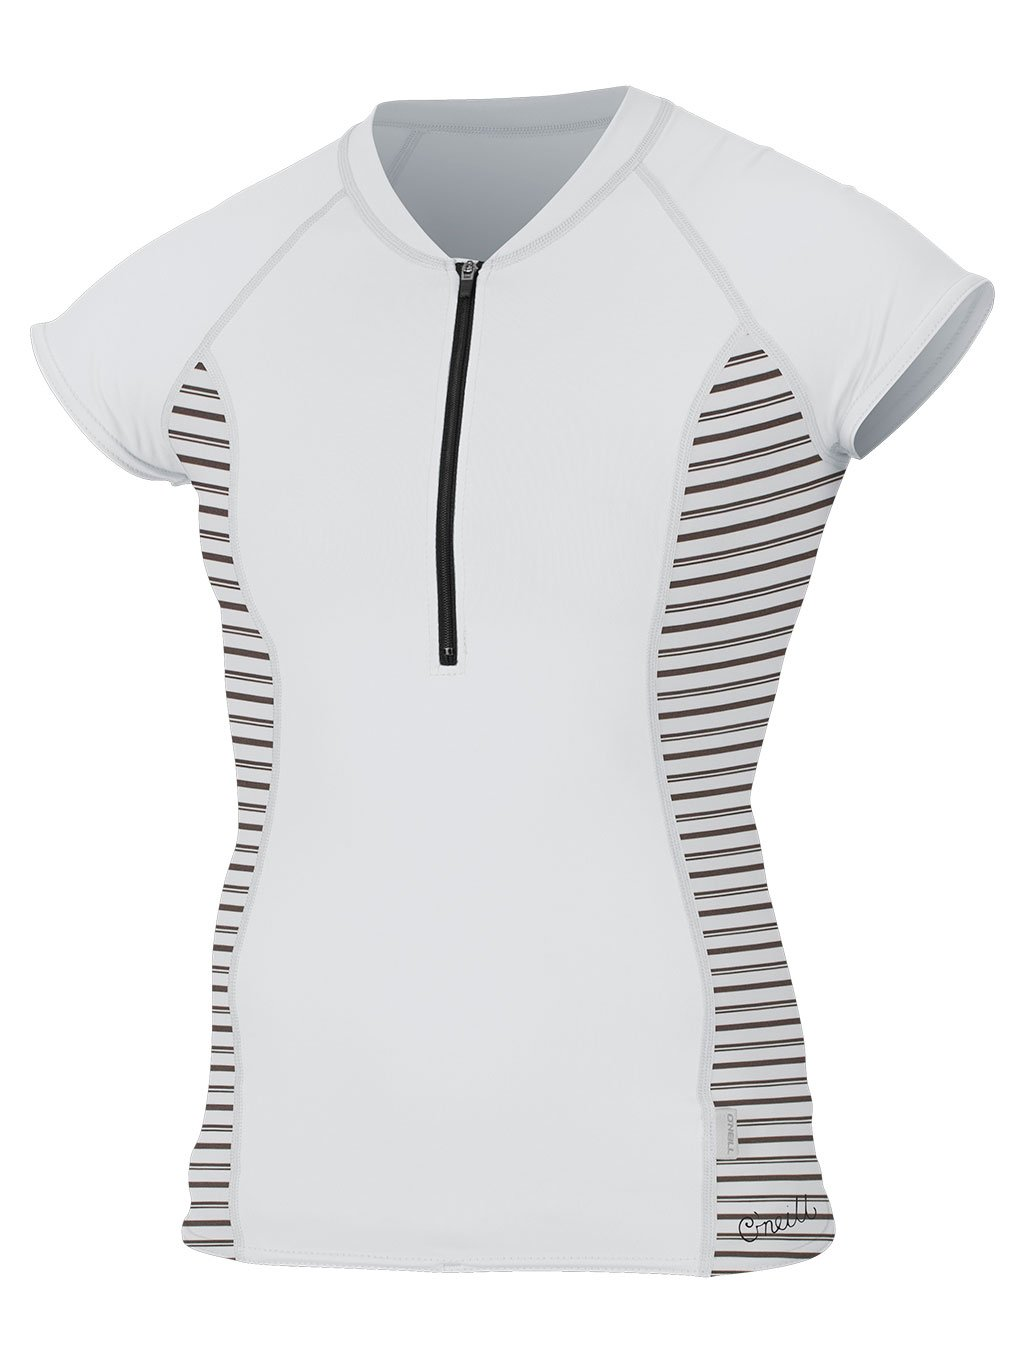 O'Neill Women's Cap Sleeve Sun Shirt Front Zip White/Highway Stripe Small